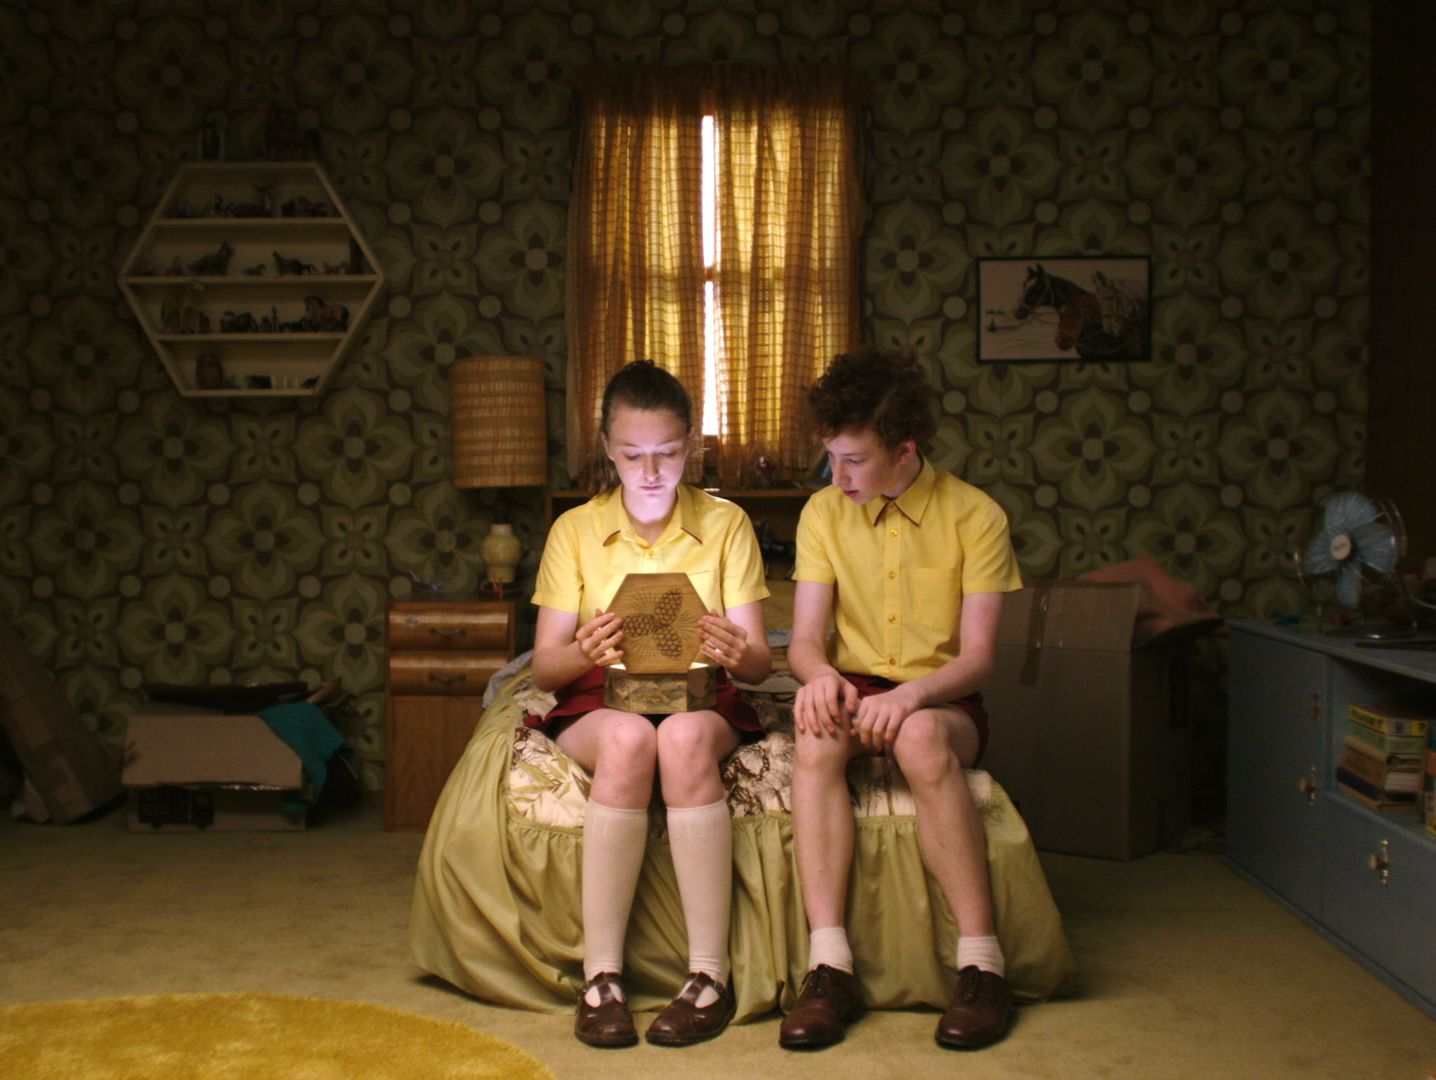 Fantastic Birthday (Girl Asleep) (BANDE ANNONCE) avec Bethany Whitmore, Eamon Farren - Le 22 mars 2017 au cinéma